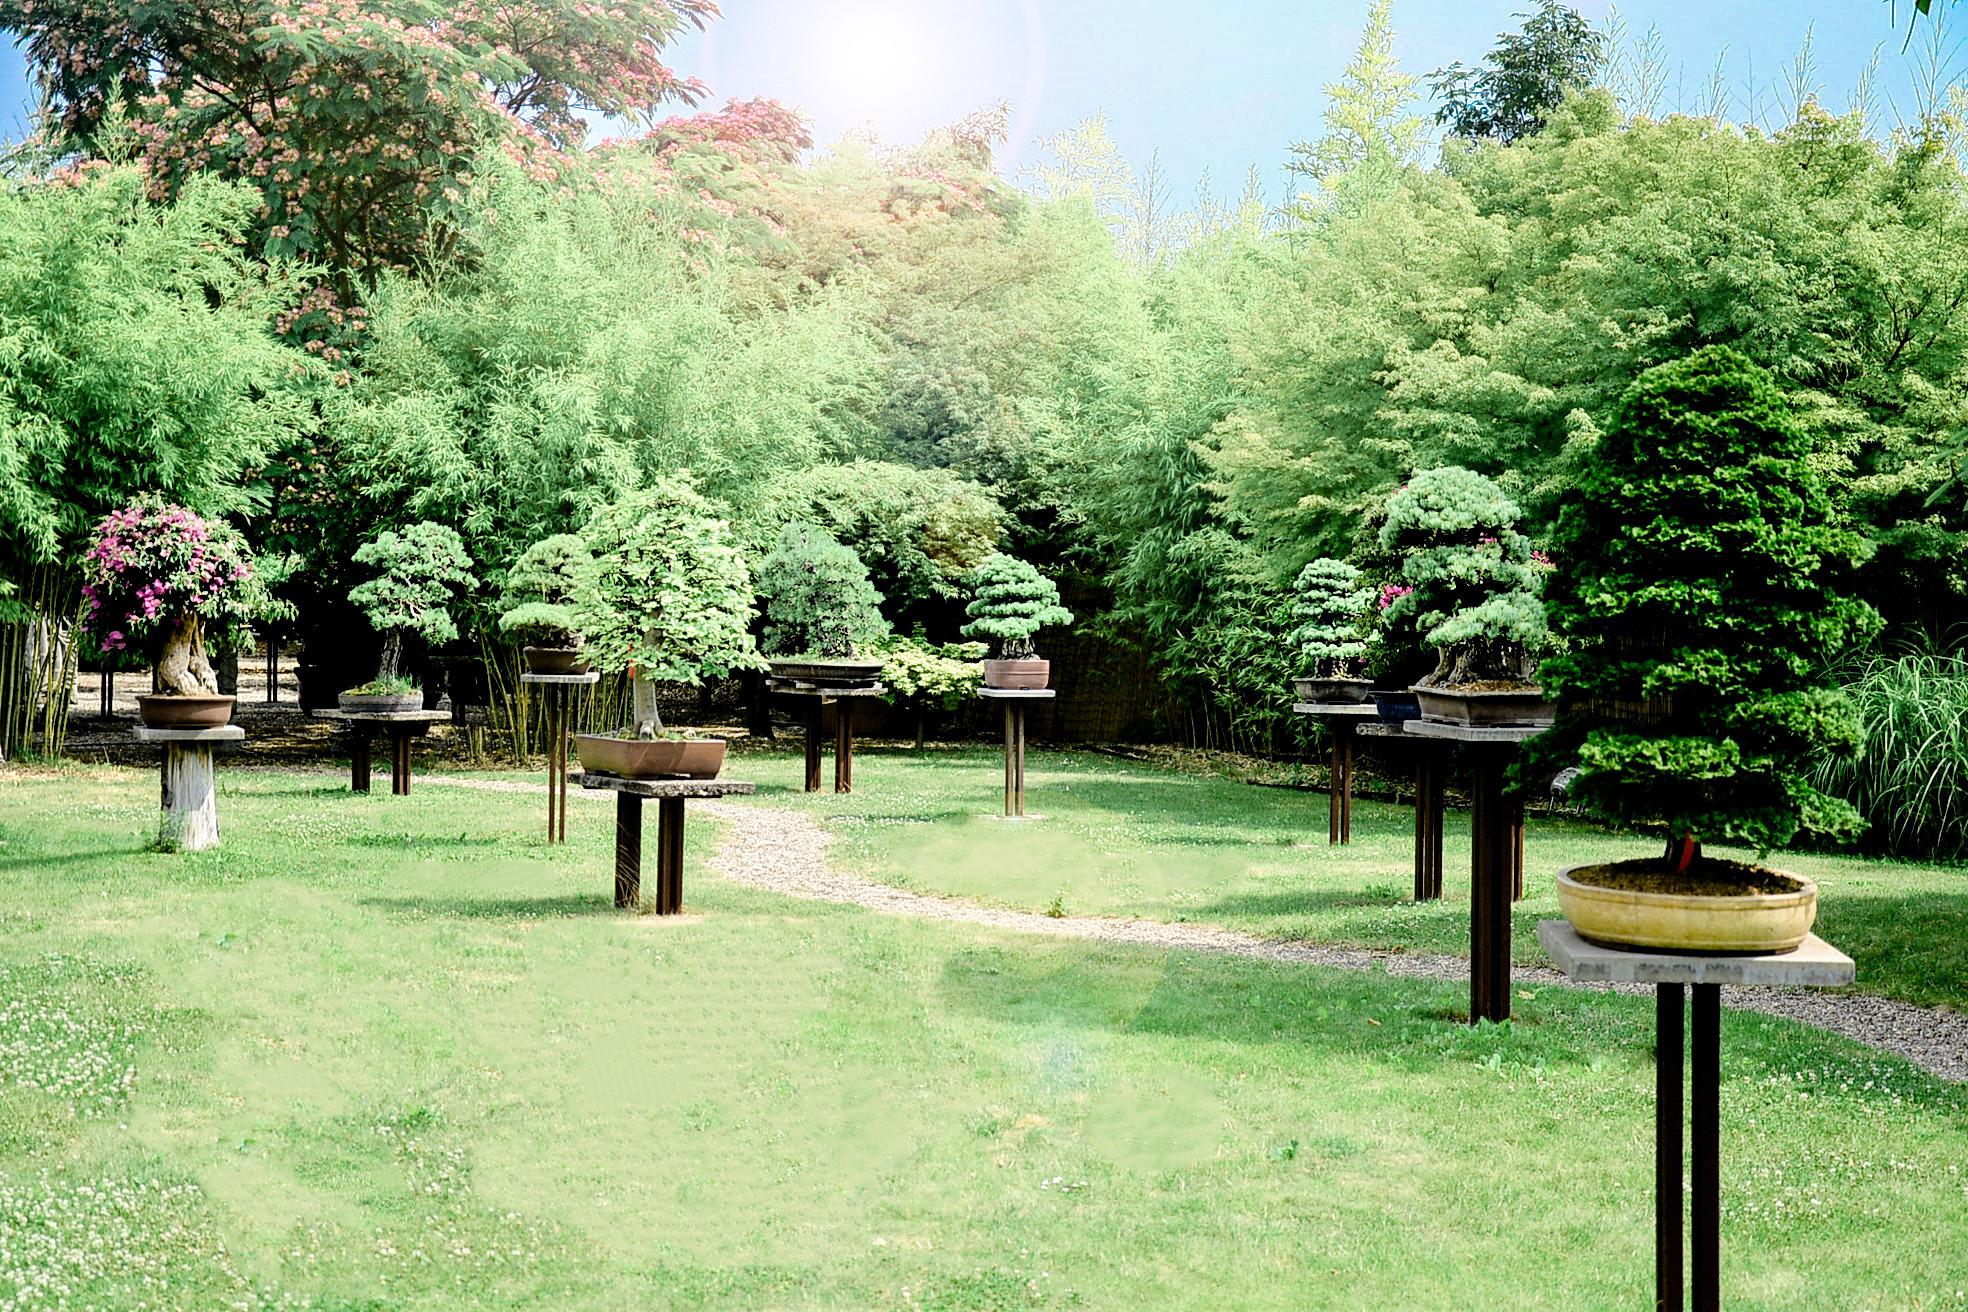 bonsai zentrum heidelberg bonsai zentrum advertorials rhein neckar zeitung. Black Bedroom Furniture Sets. Home Design Ideas